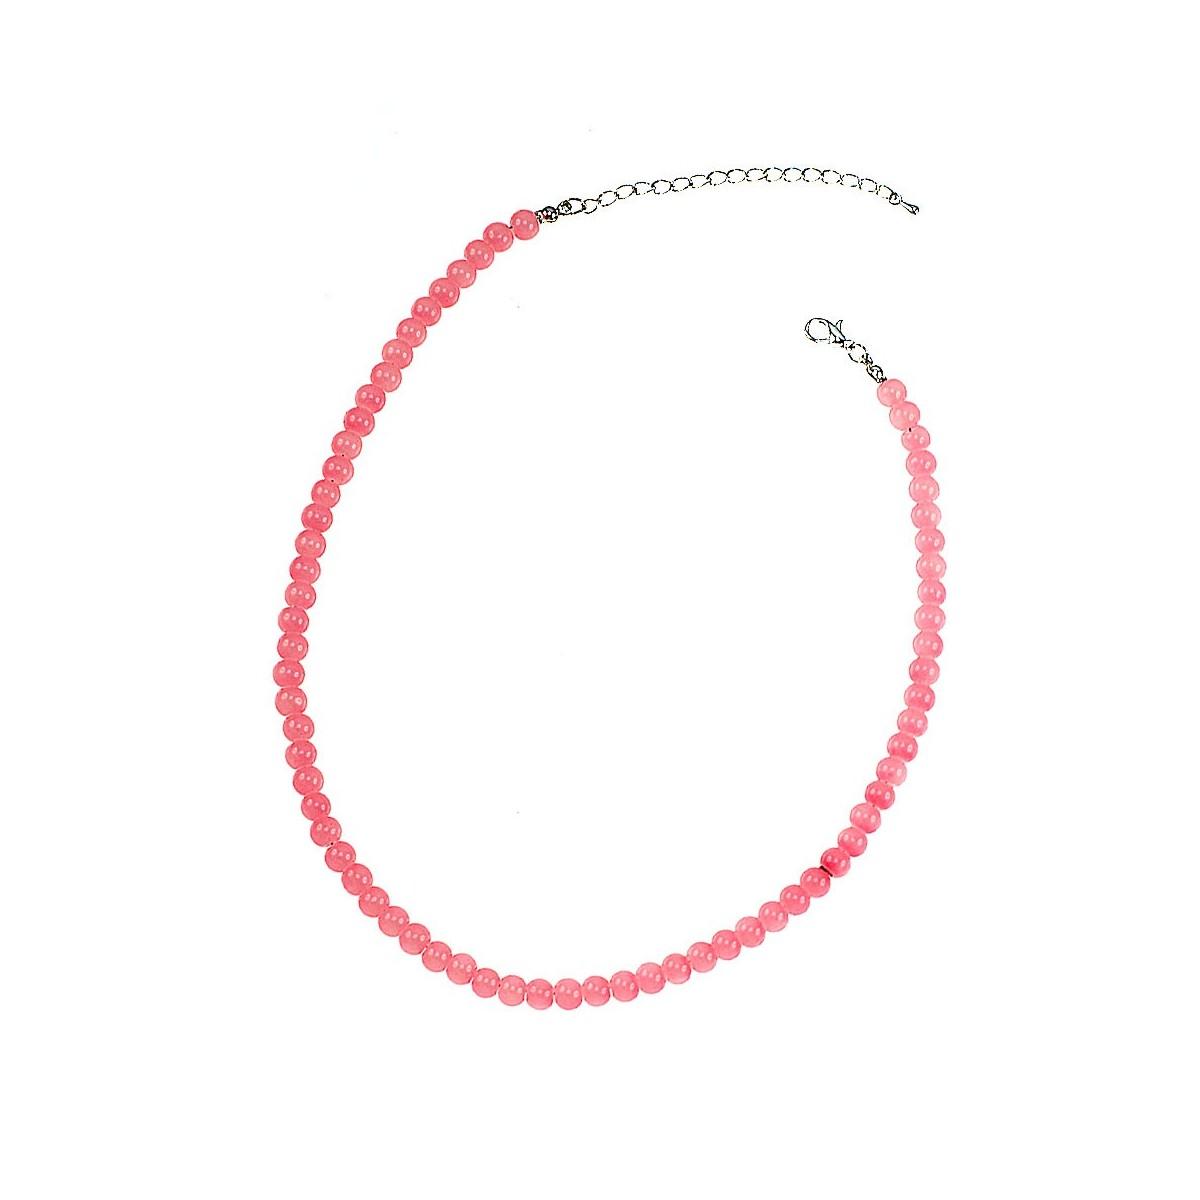 Collier perles de verre rose